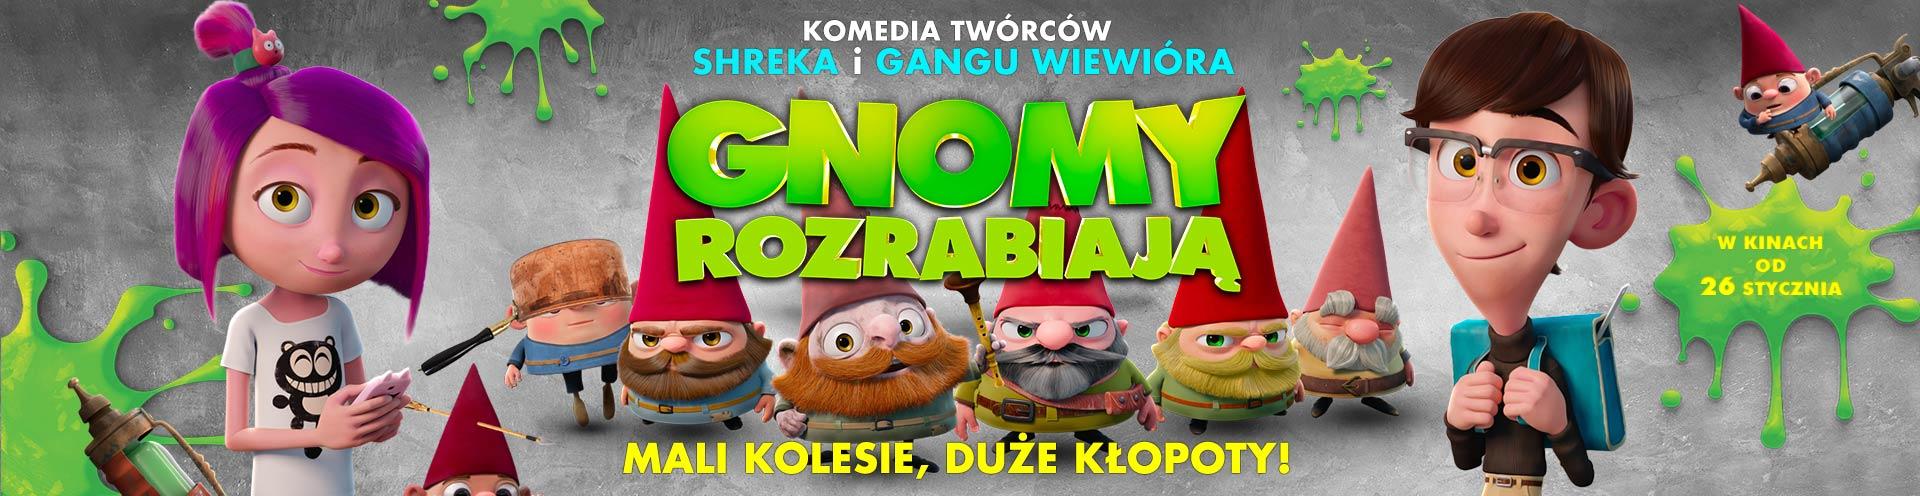 gnomy-rozrabiaja-slider.jpg